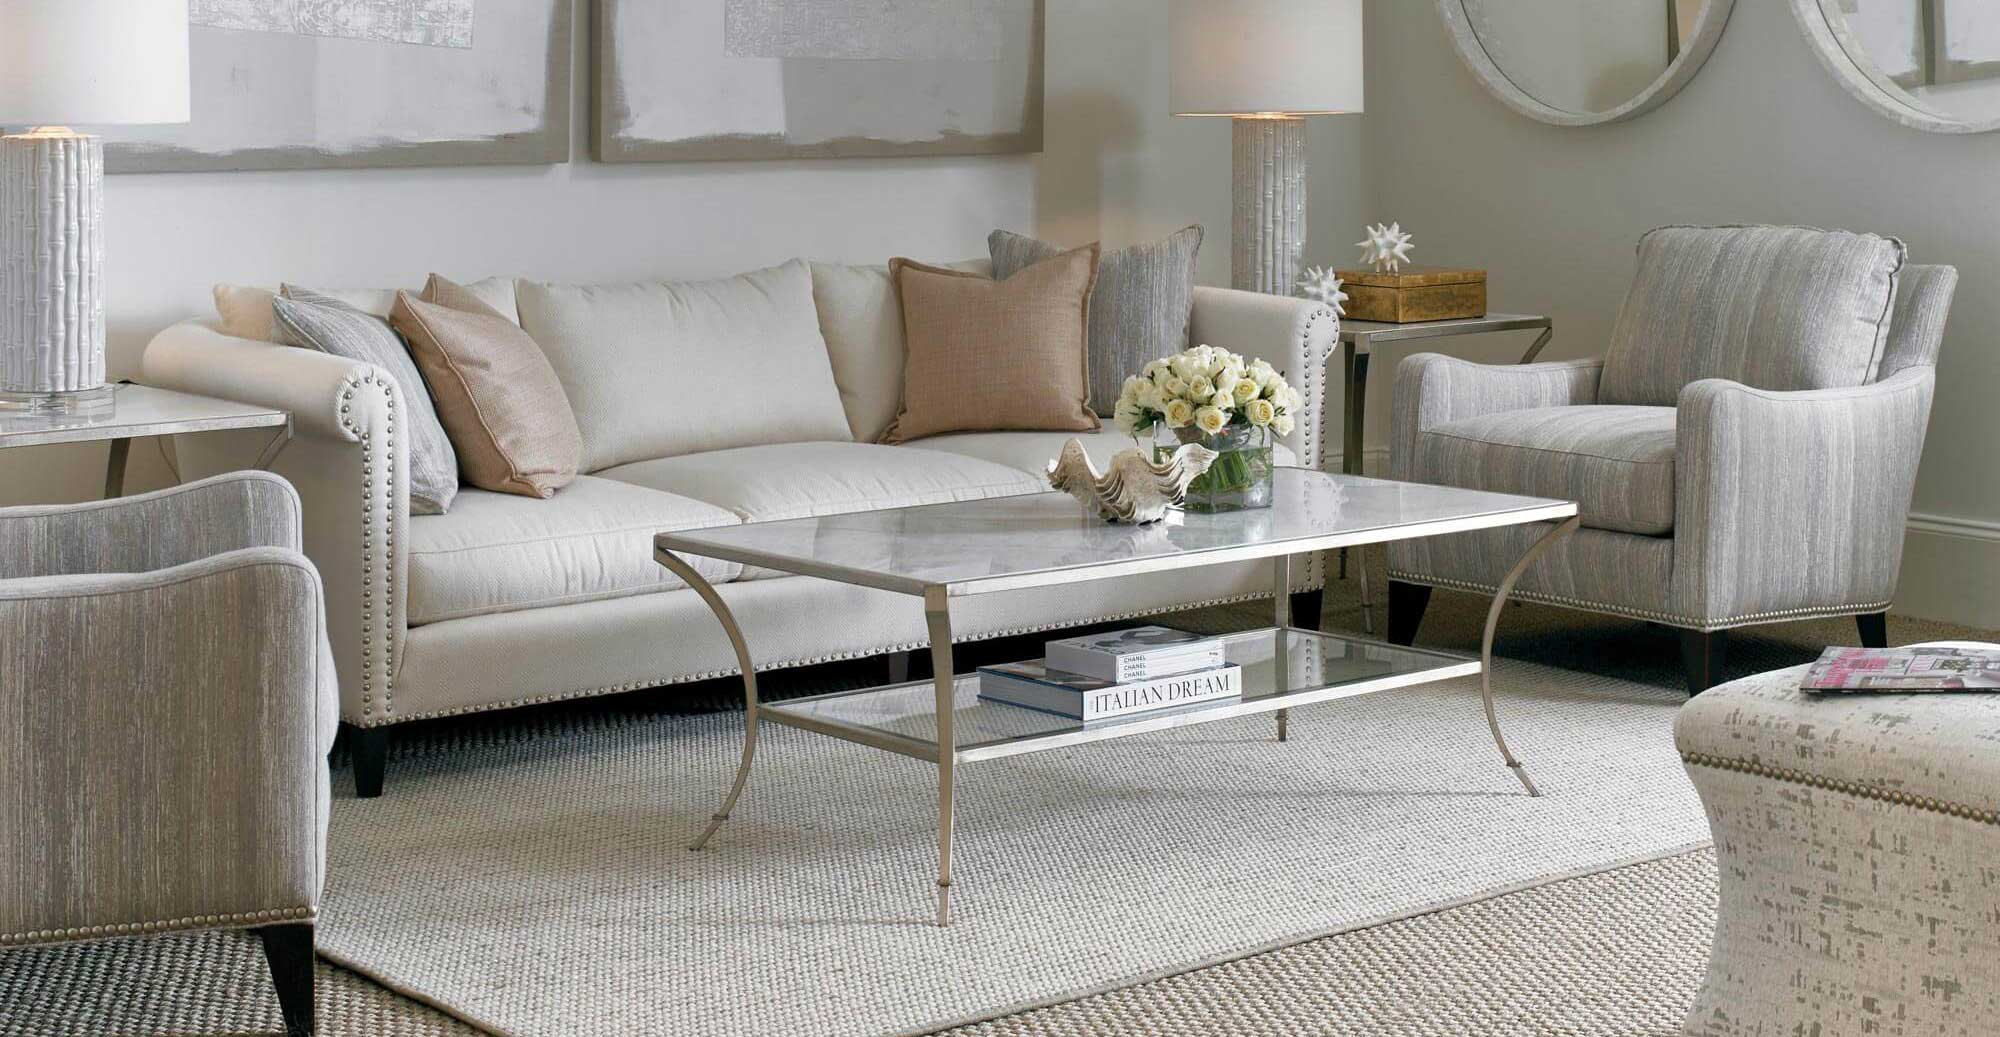 Where To Buy Sherrill Furniture